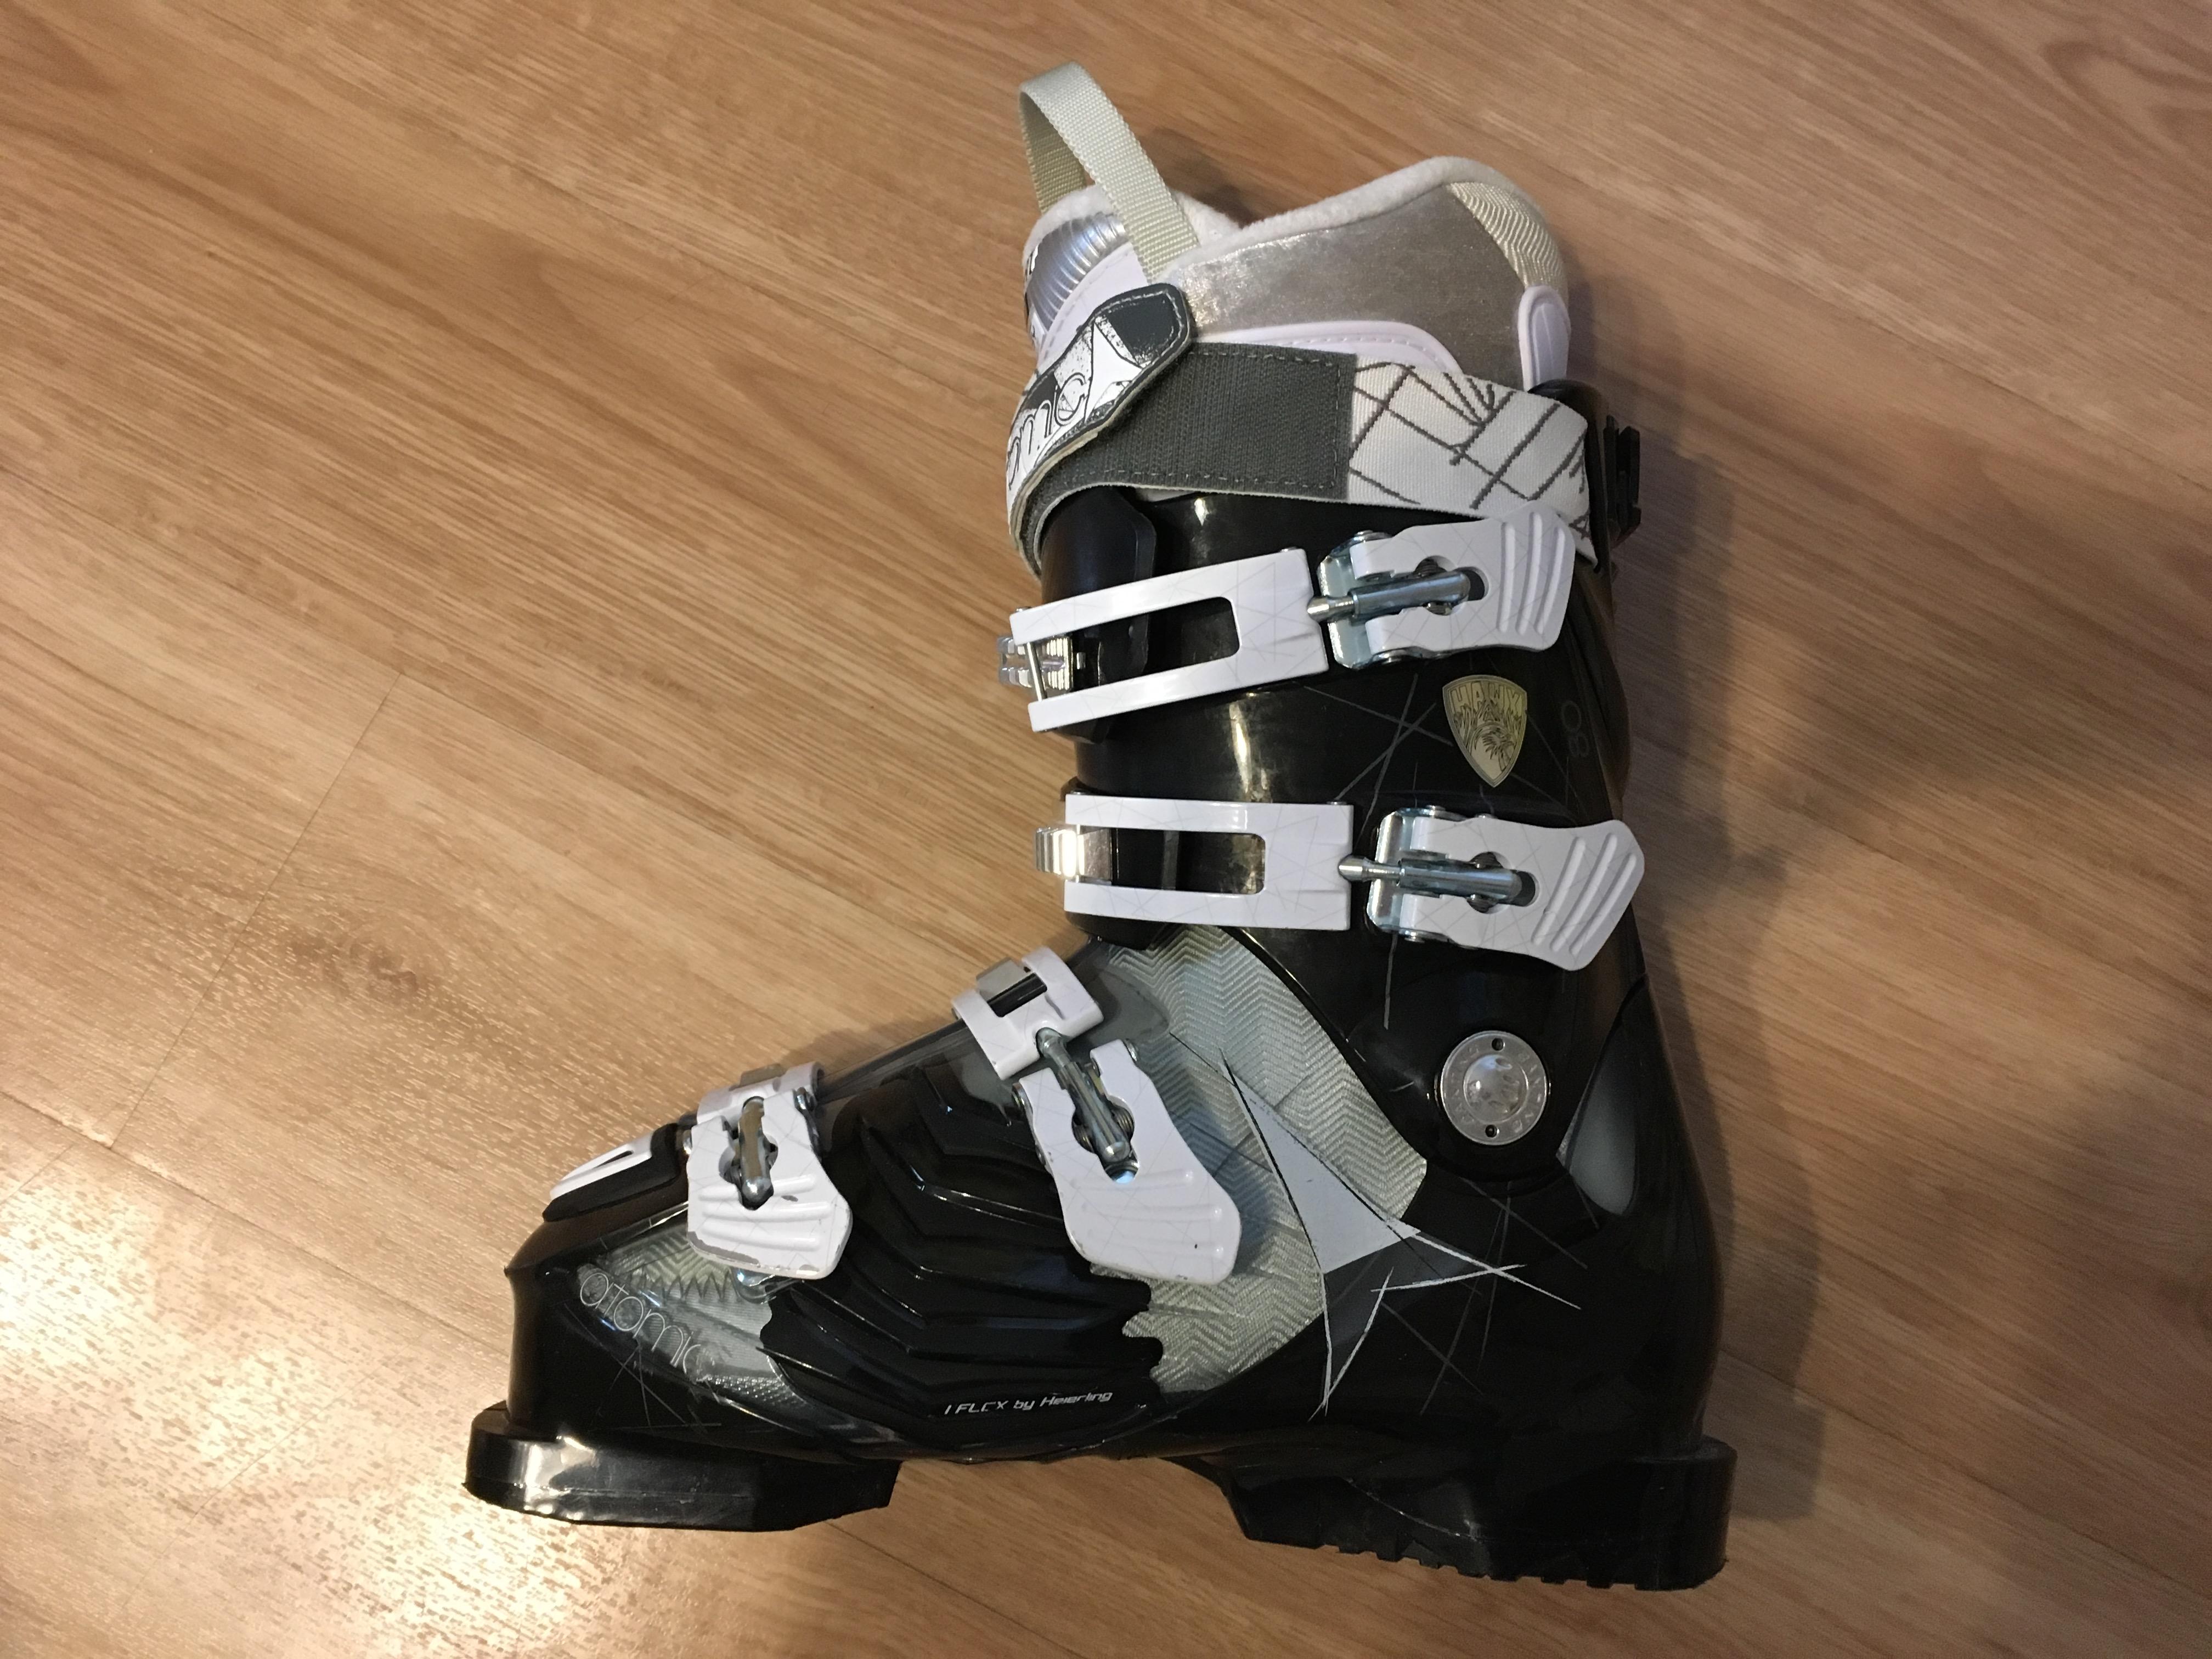 774922438c5 Dámské lyžařské boty Atomic Hawx 1.0 80W - Bazar - SNOW.CZ